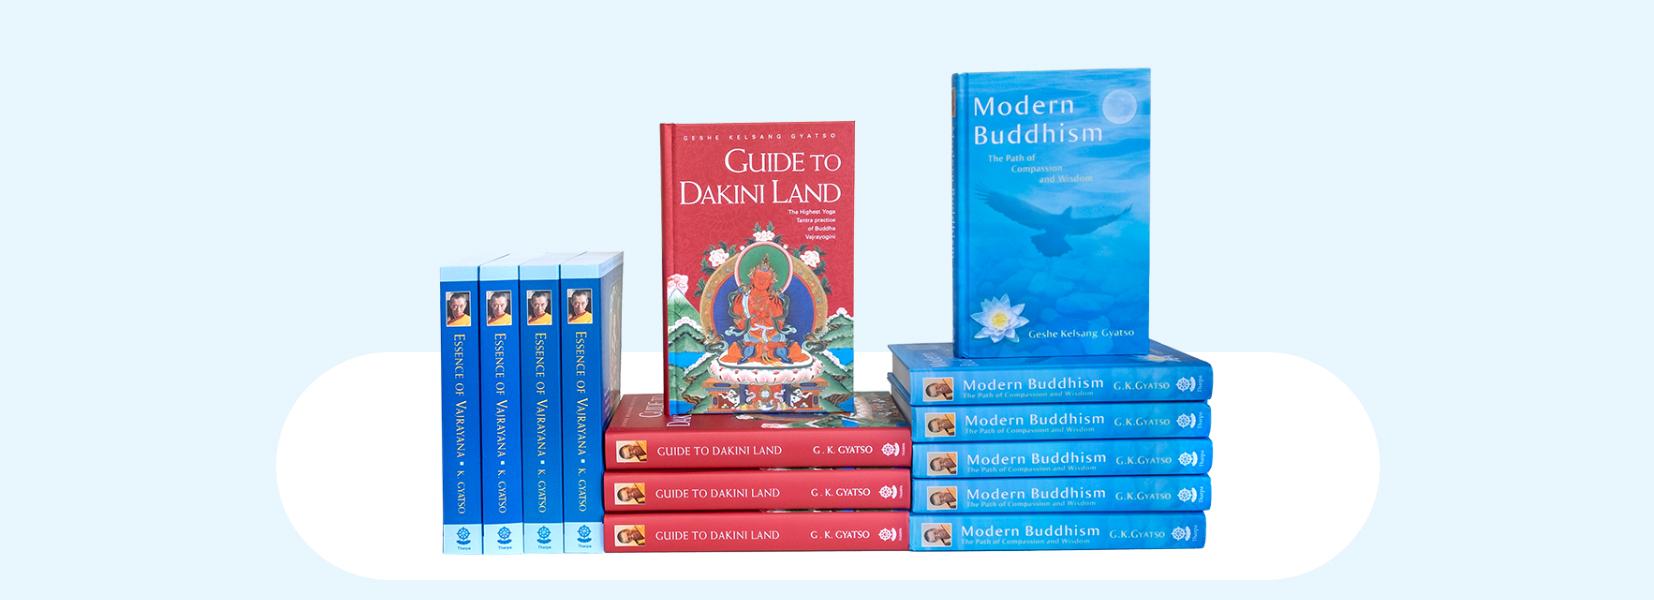 reduced-price-books-no-gtm-3